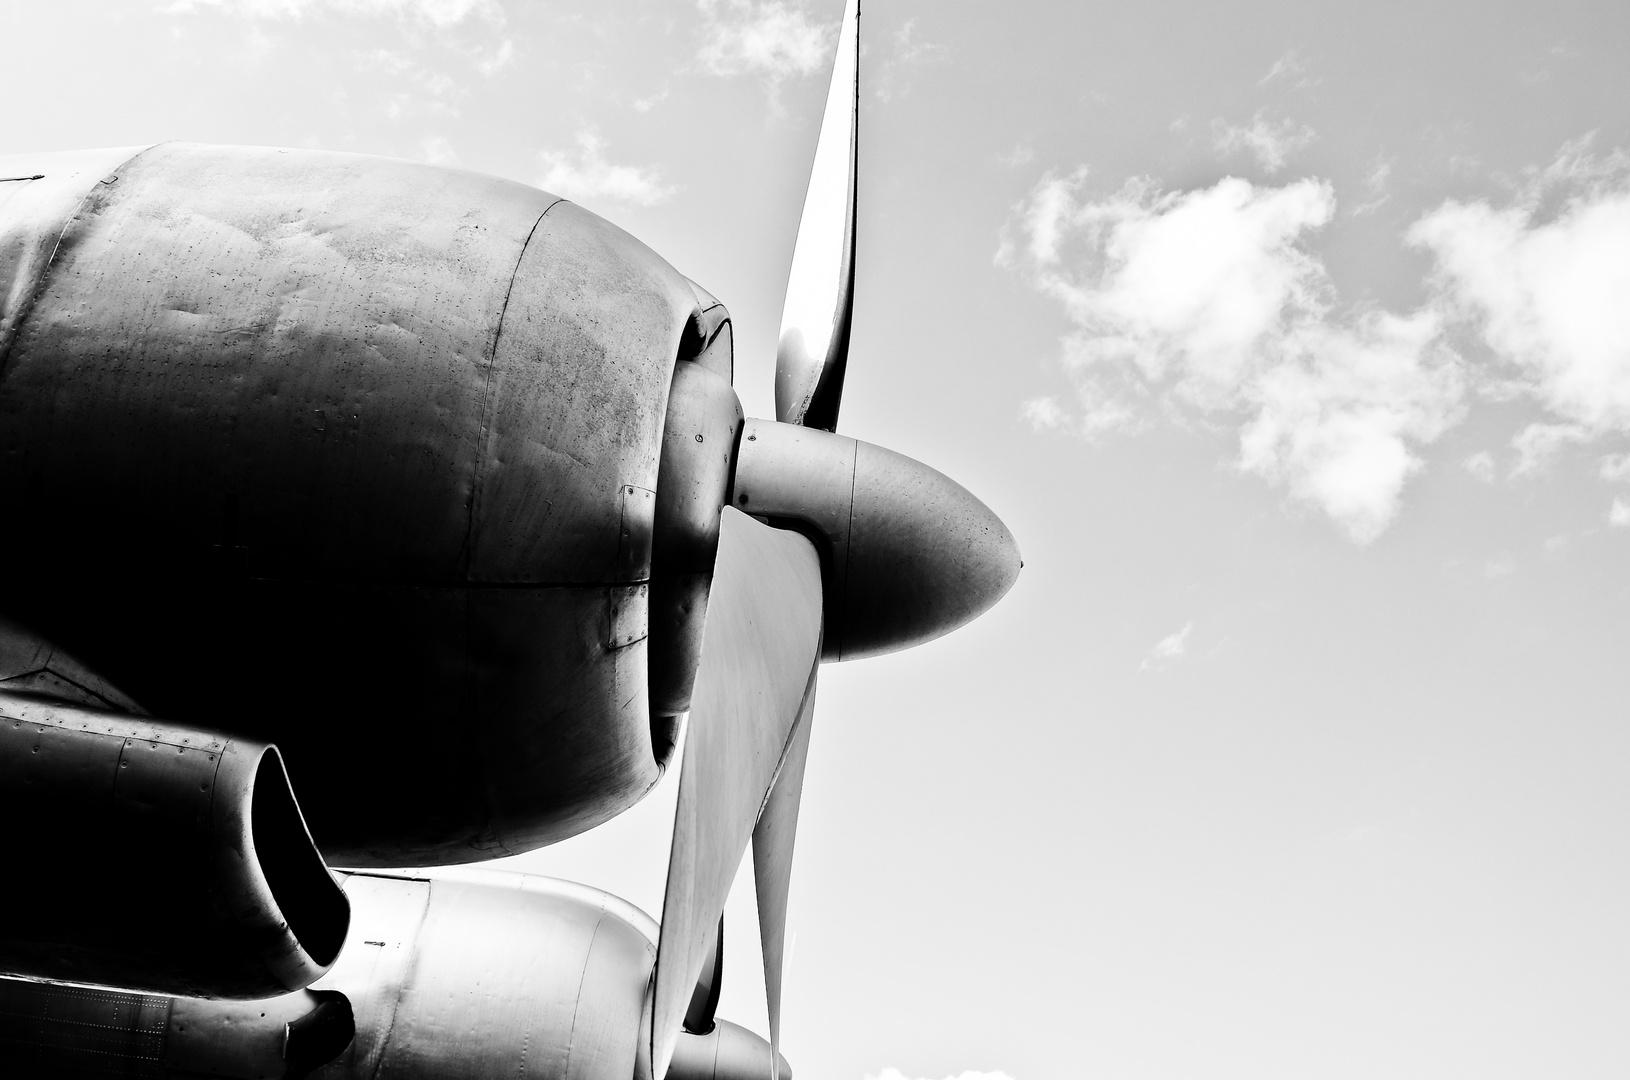 Flugzeug Propeller 2